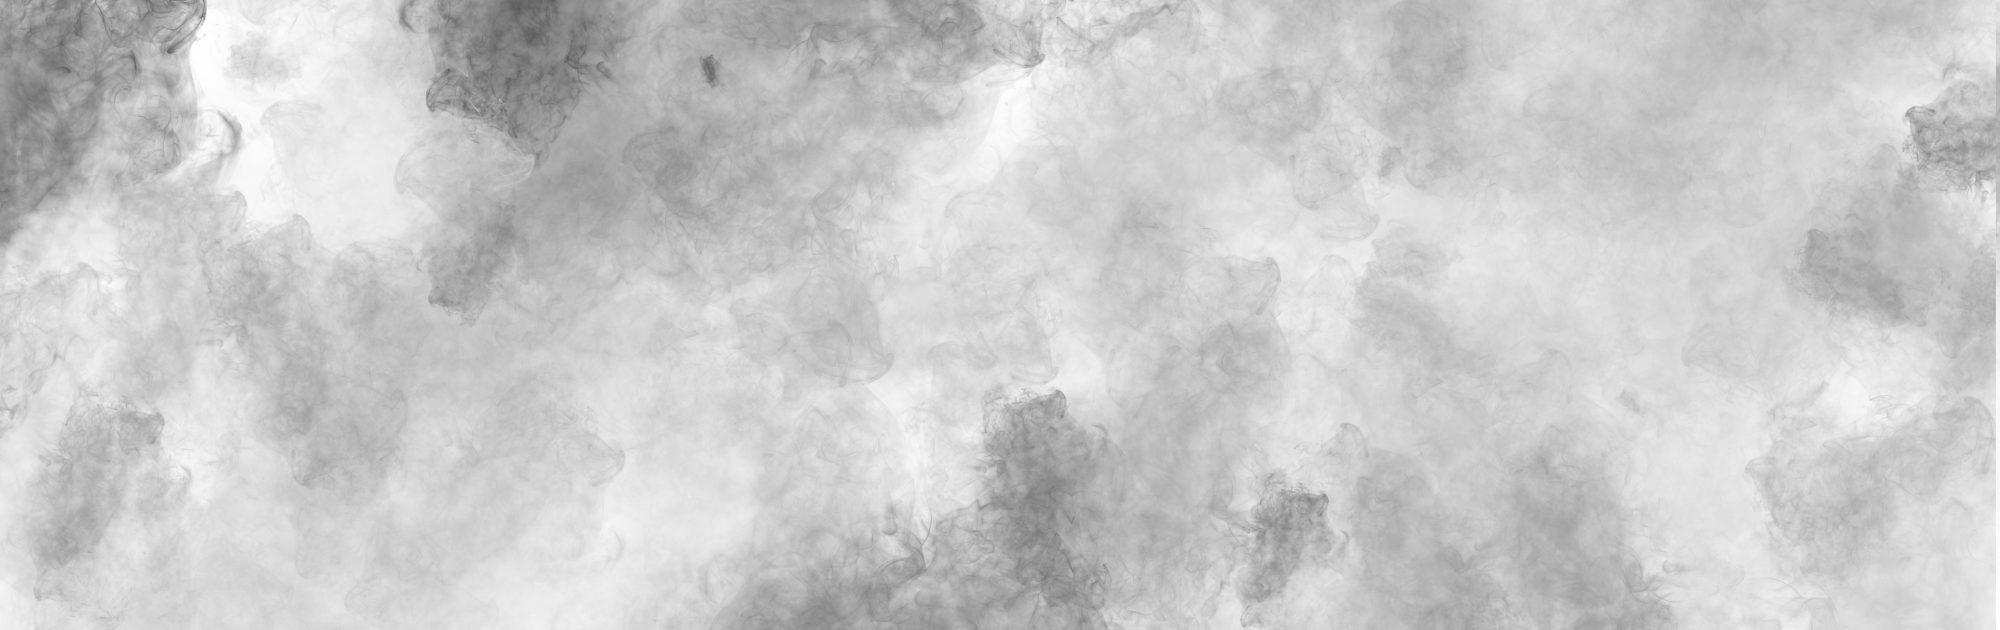 PaulWernerMusic Background Rauch 2000x630